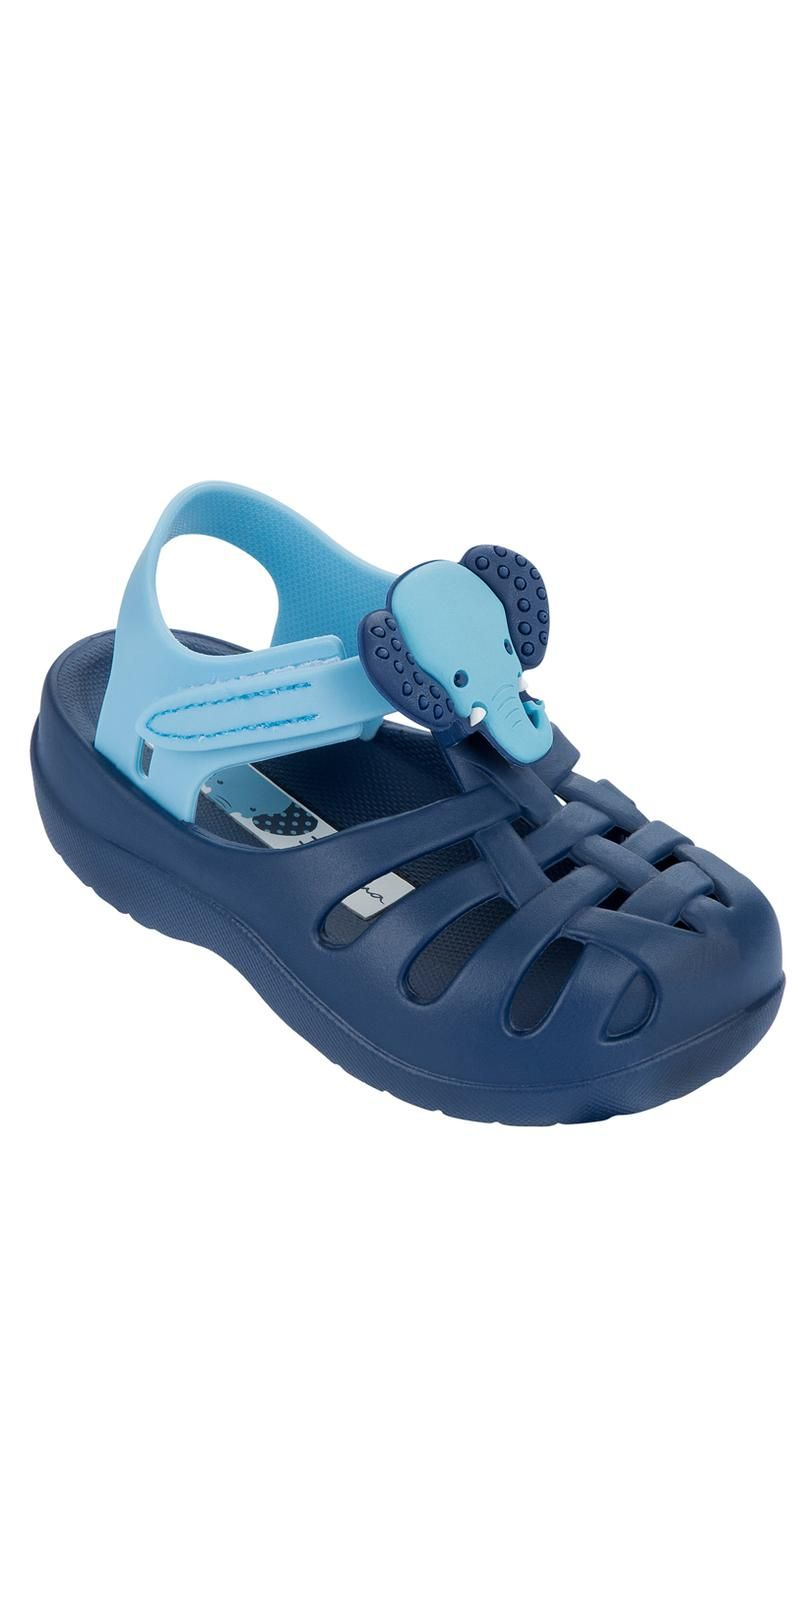 Ipanema Kitty Sandal Baby//Infant Sandals